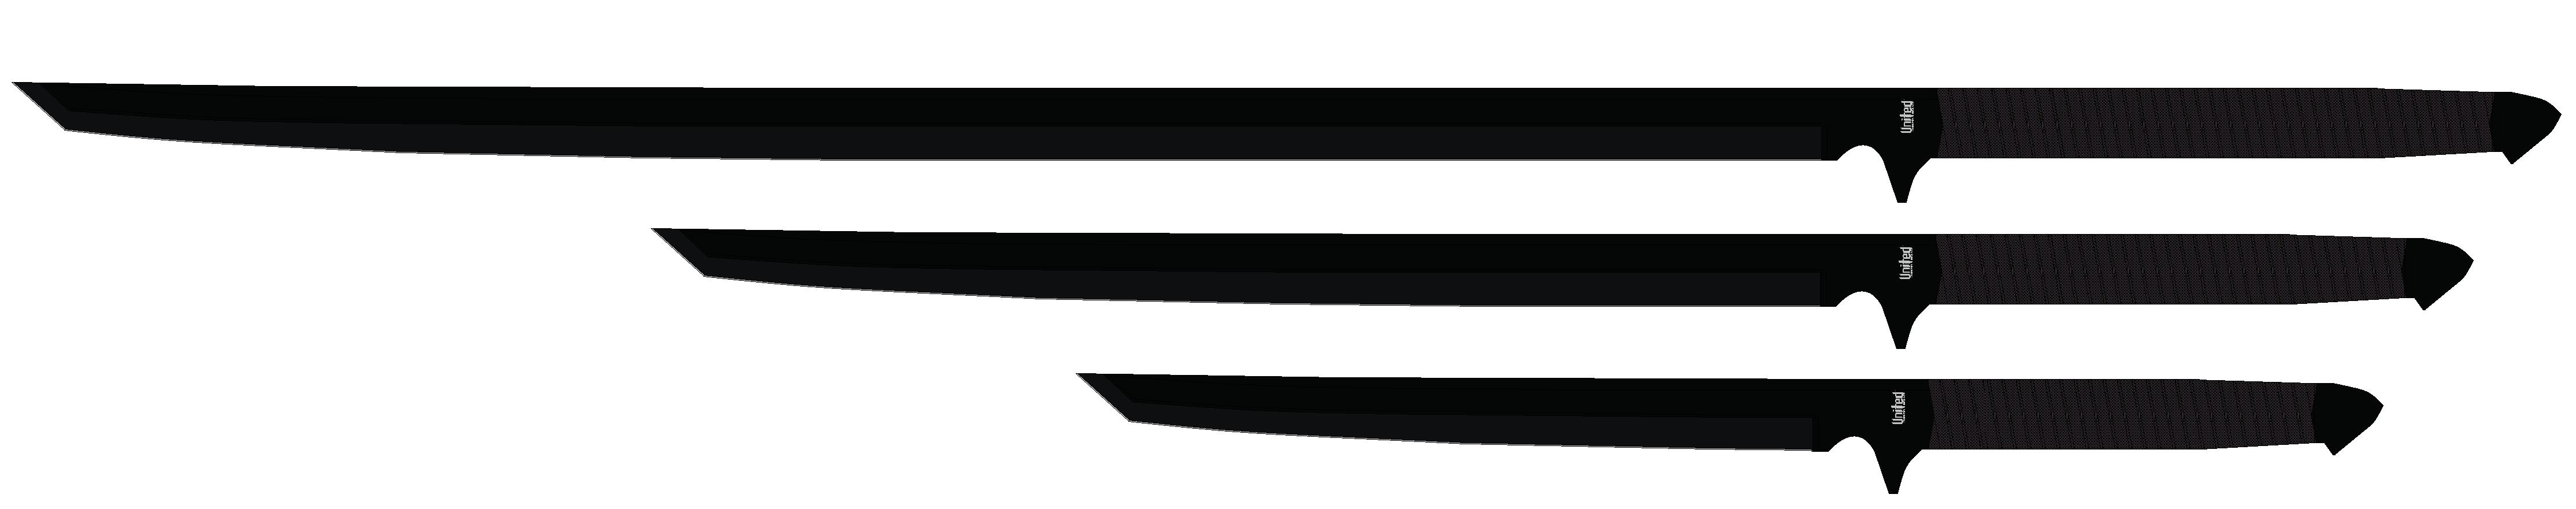 I Black_ronin_ninja_swords_sat_by_bagera3005-d623kux